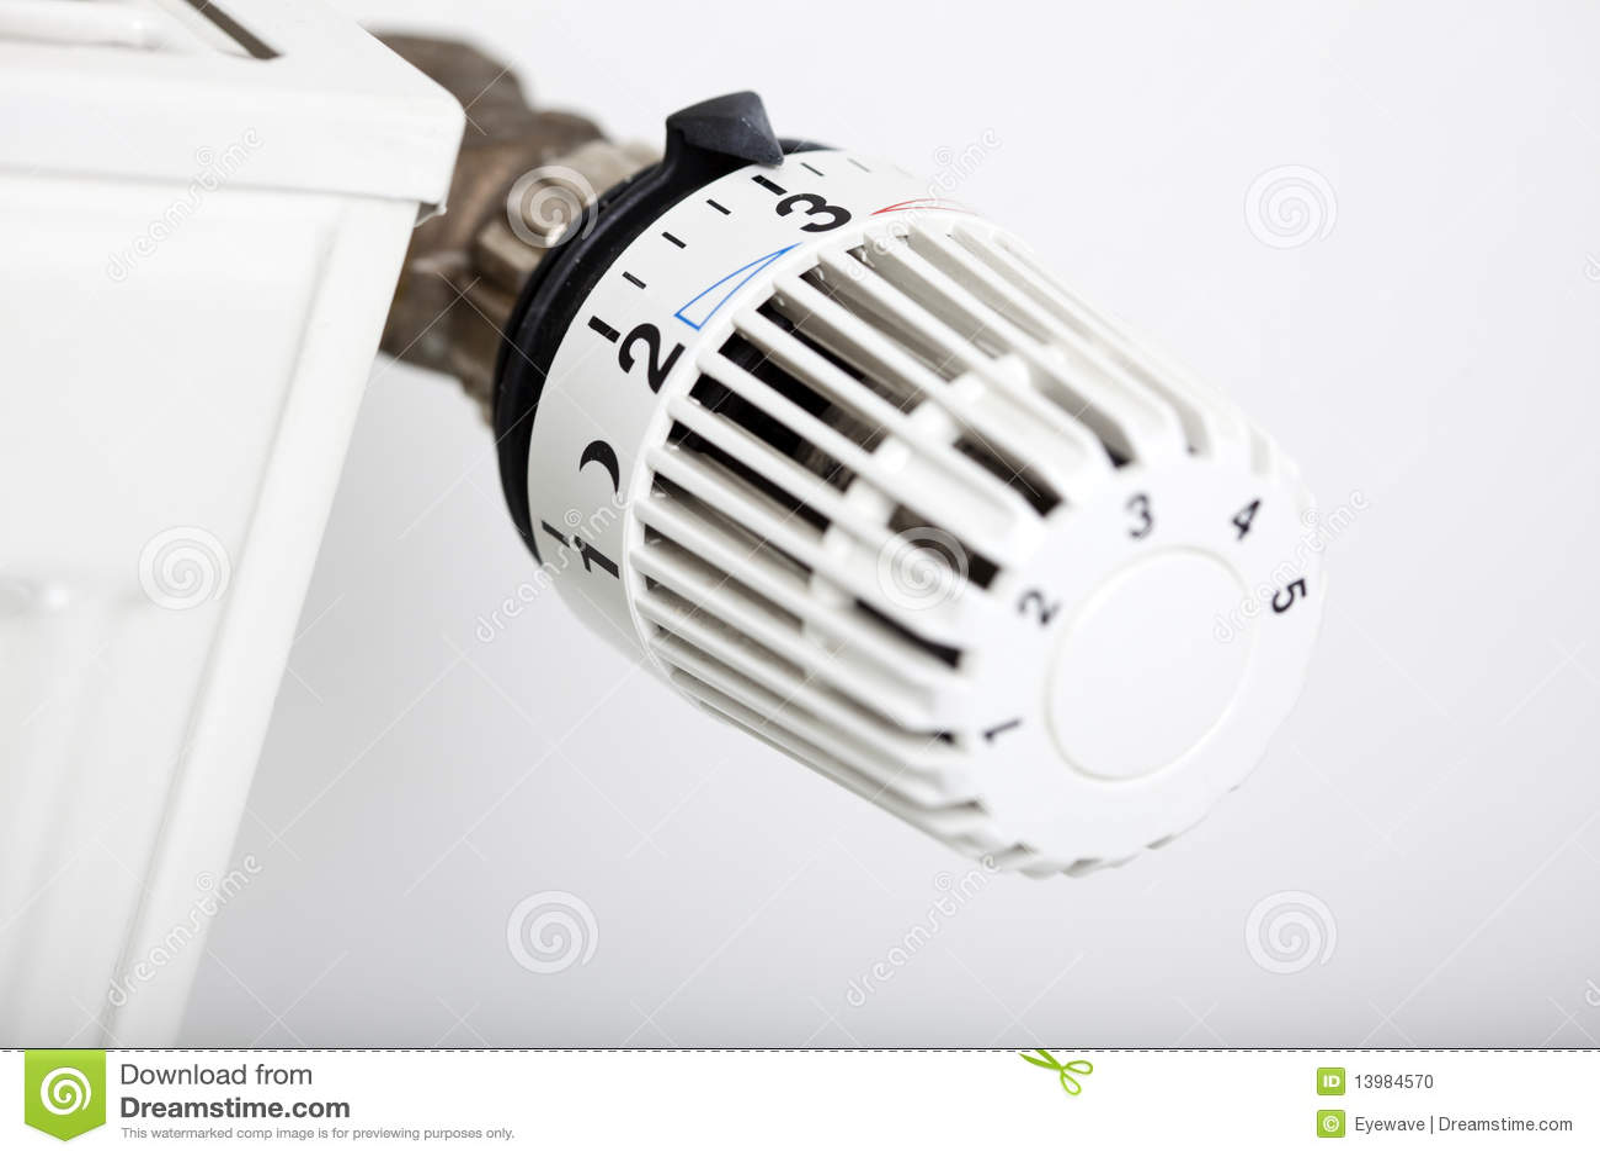 V lvula termost tica do radiador foto de stock imagem - Valvula termostatica radiador ...